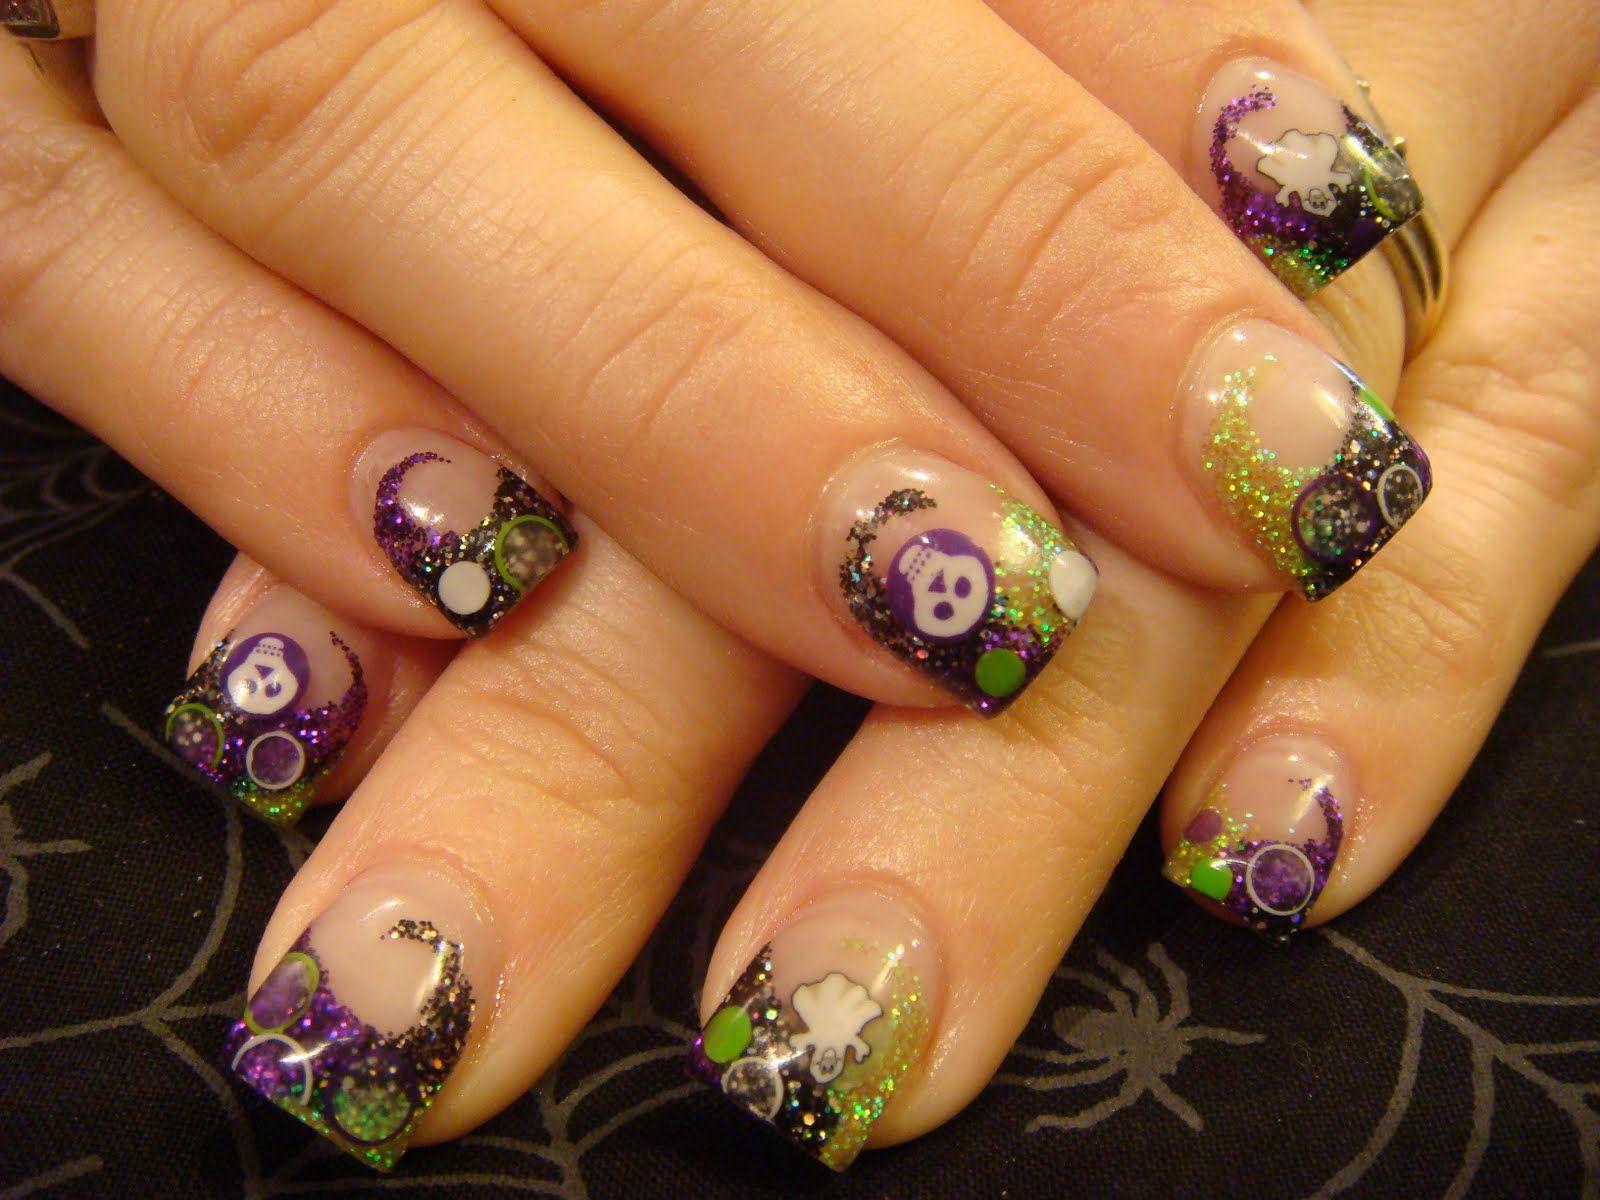 halloween nails | Halloween nails acrylic | Holiday Nail Art ...